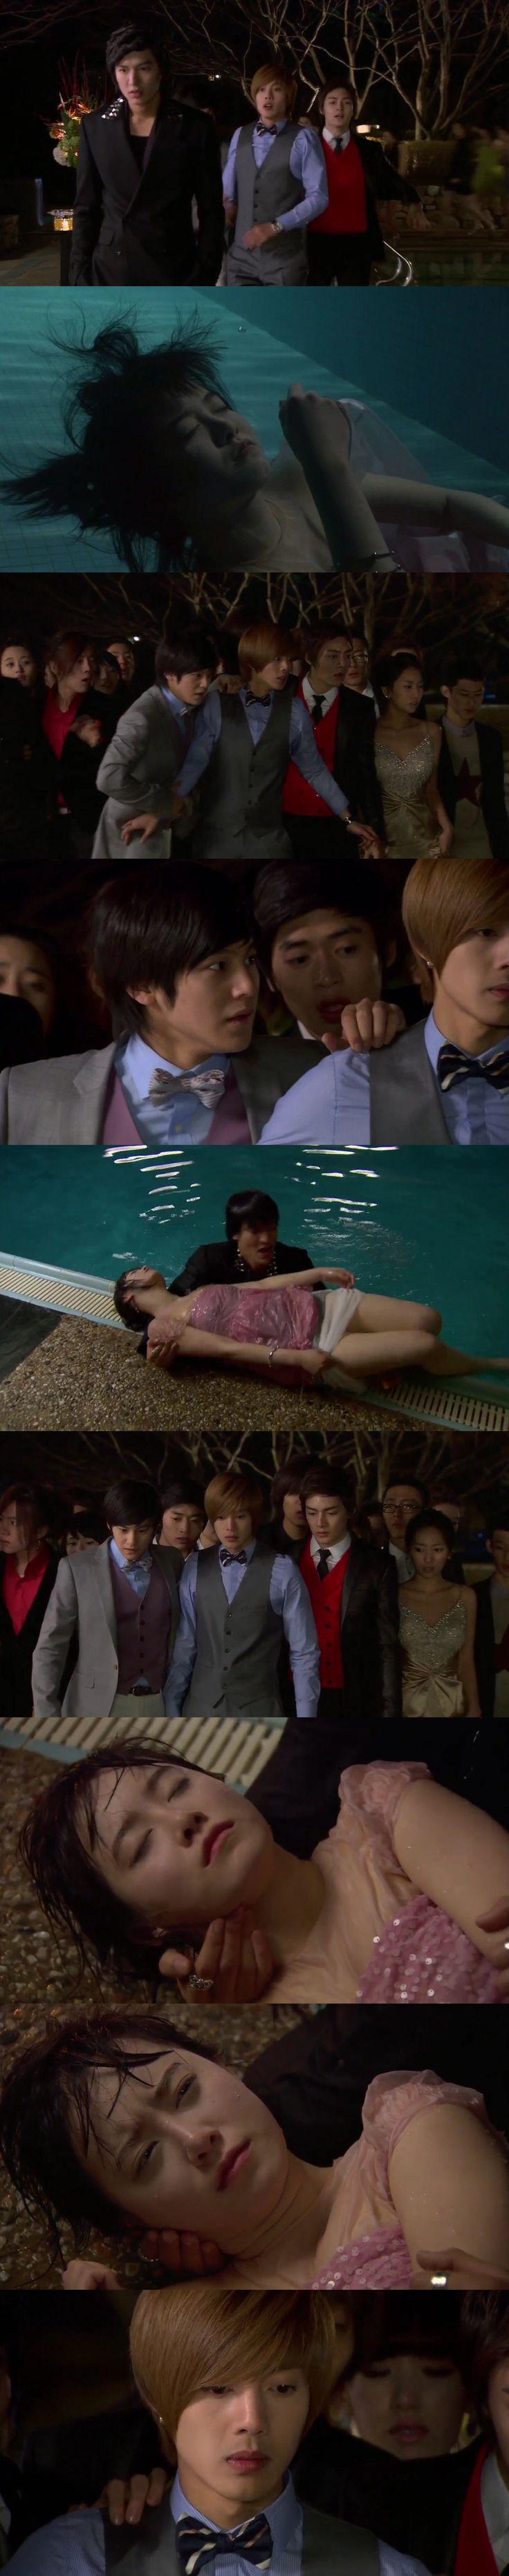 ku hye sun and lee min ho dating Ku hye-sun (hangul: 구혜선 she starred as geum jan-di in the megahit boys over flowers with lee min-ho //wwwdramafevercom/news/breaking-gu-hye-sun-and.